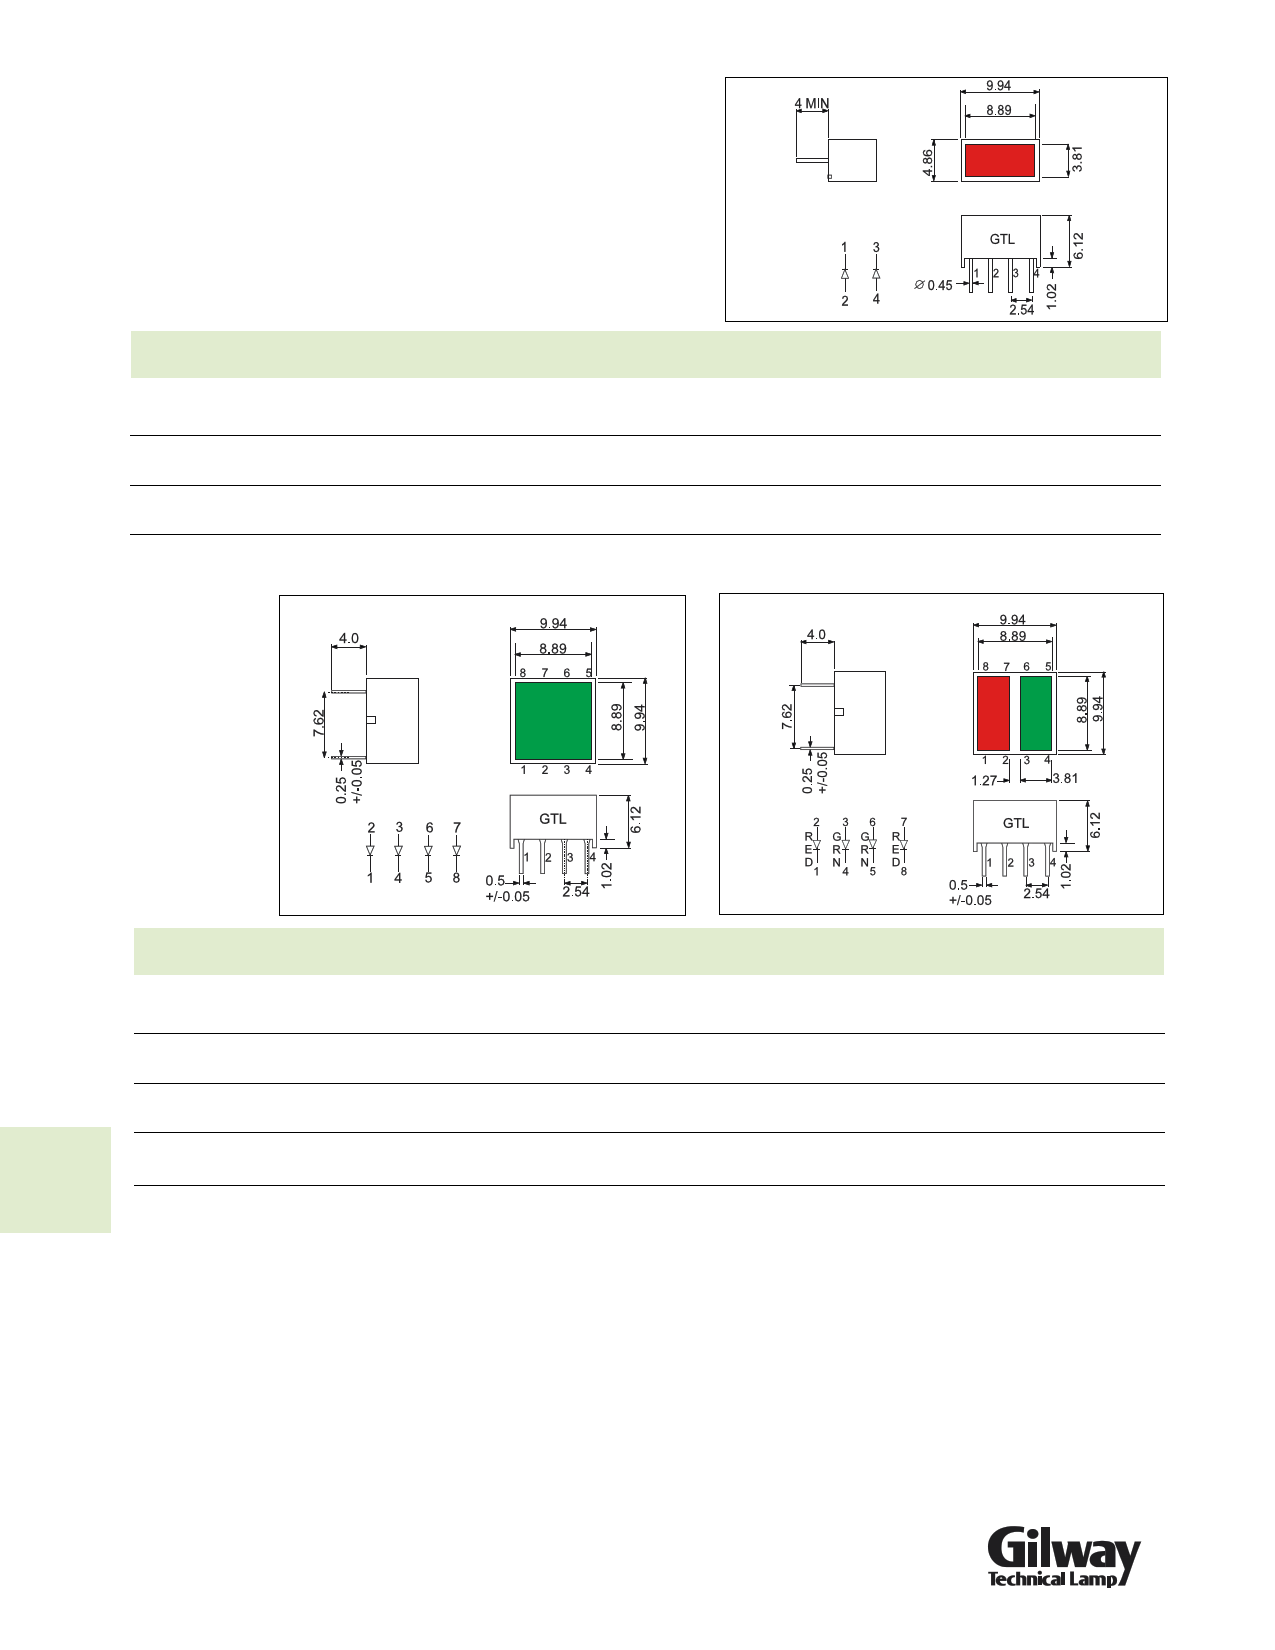 E1010 datasheet